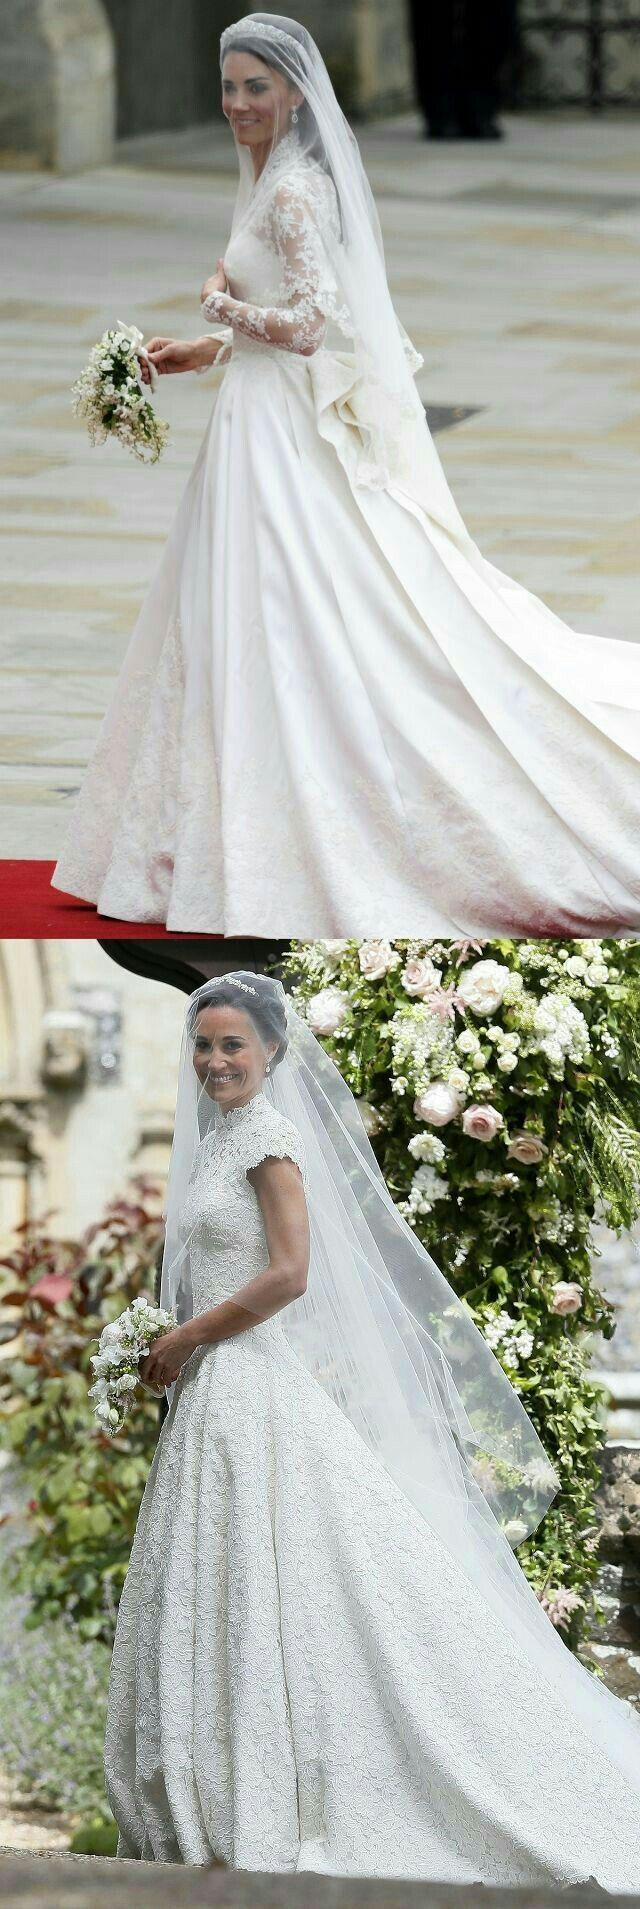 Famous wedding dresses  Pin by Damaris de León Ruiz on William u Kate  Pinterest  William kate